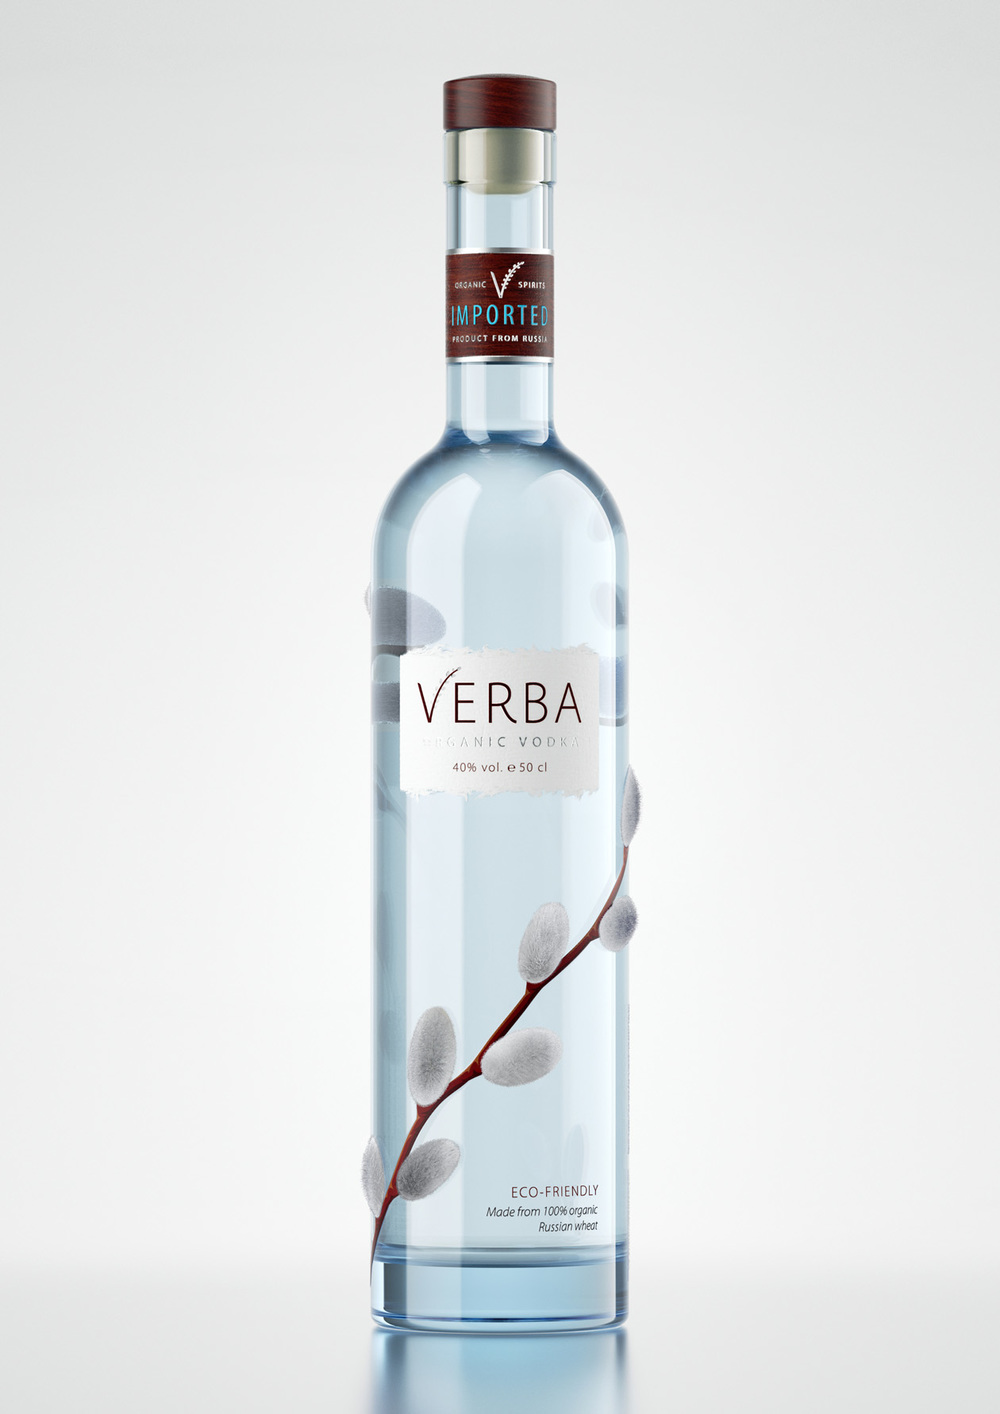 02_VERBA_Vodka_front.jpg